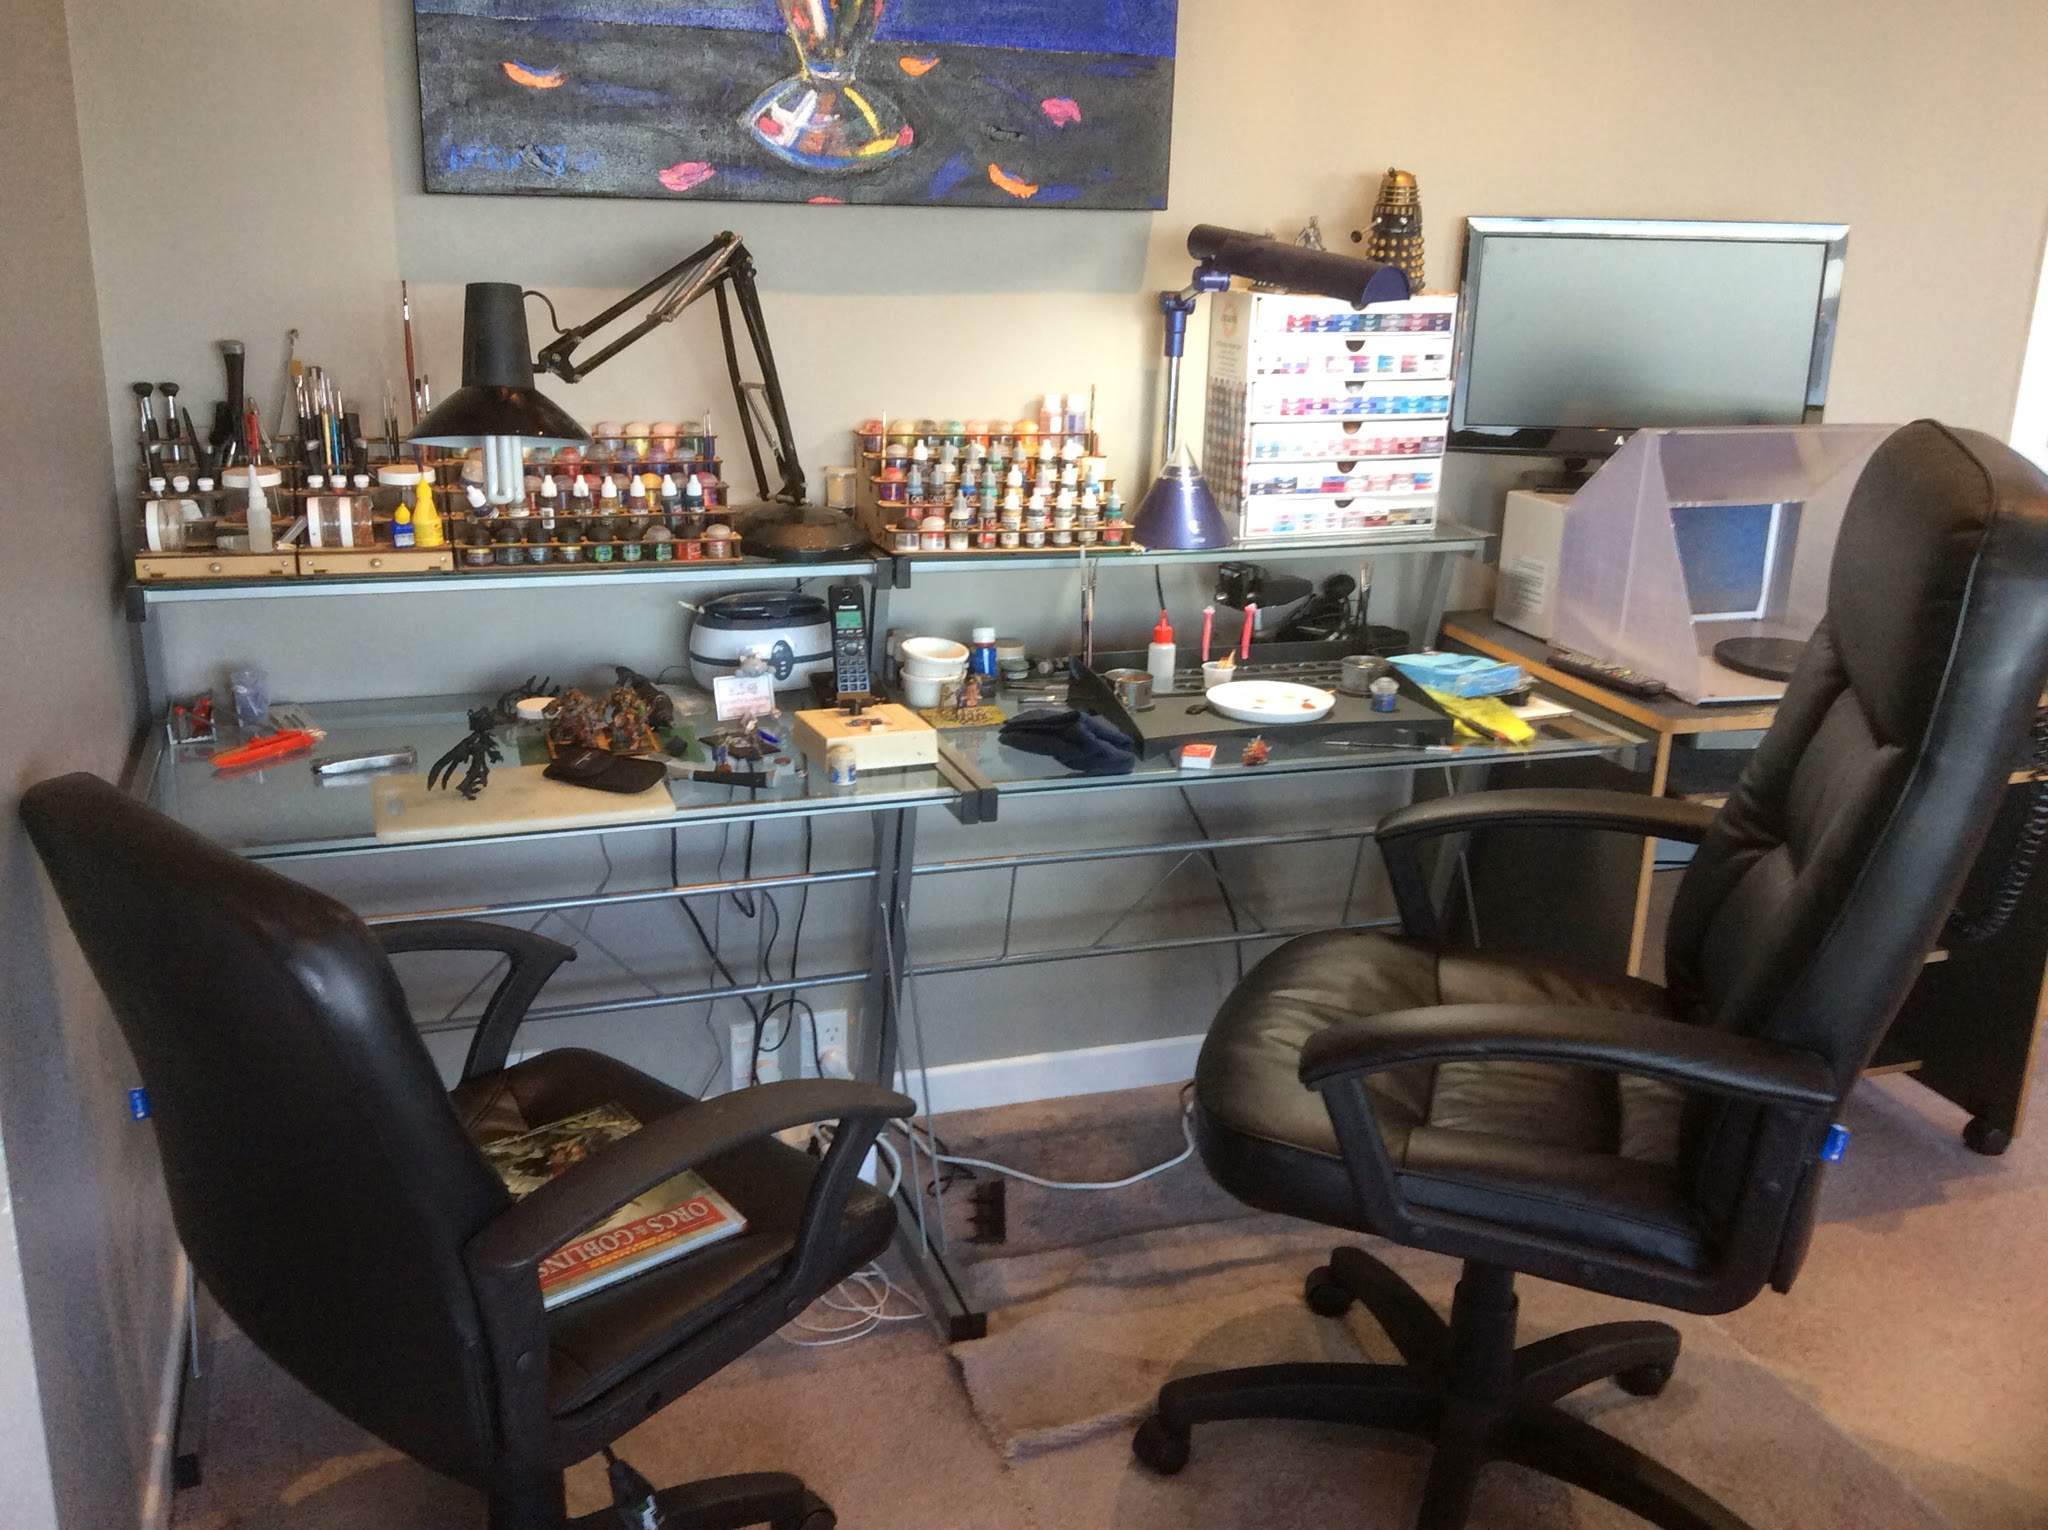 Using Airbrush To Paint Room